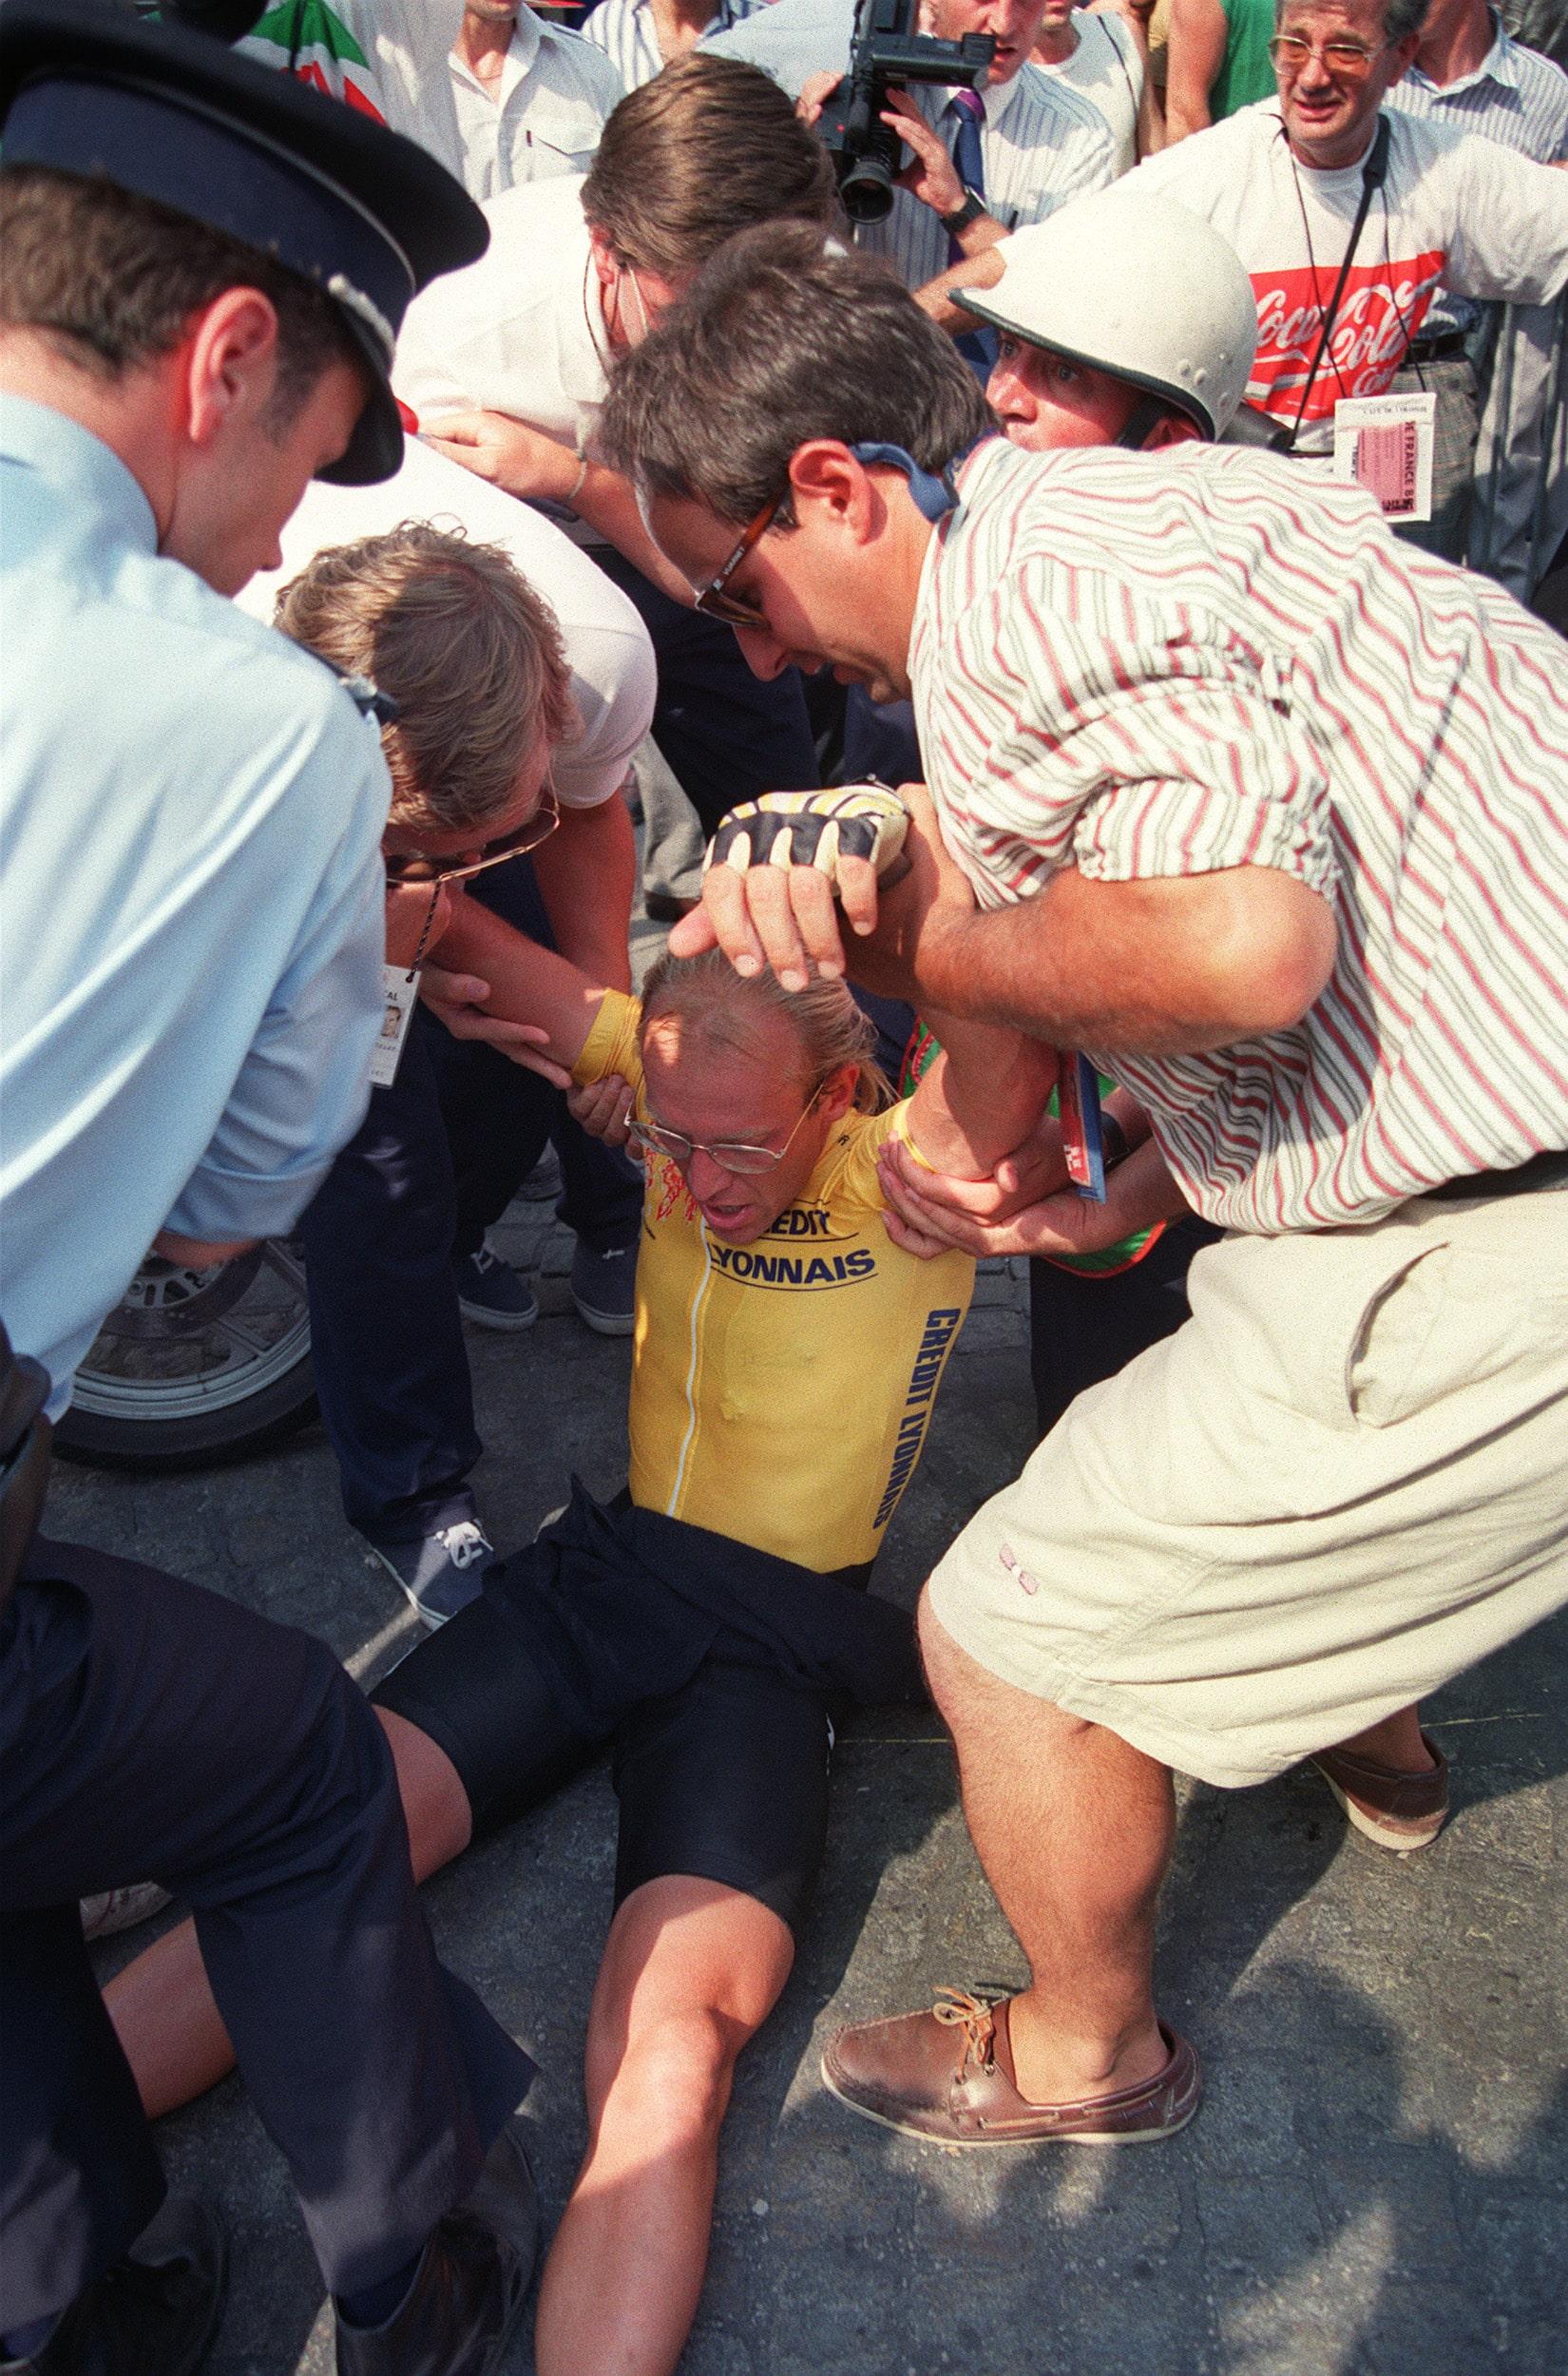 Fignon perdió el Tour de Francia en la contrarreloj final ante Greg Lemond